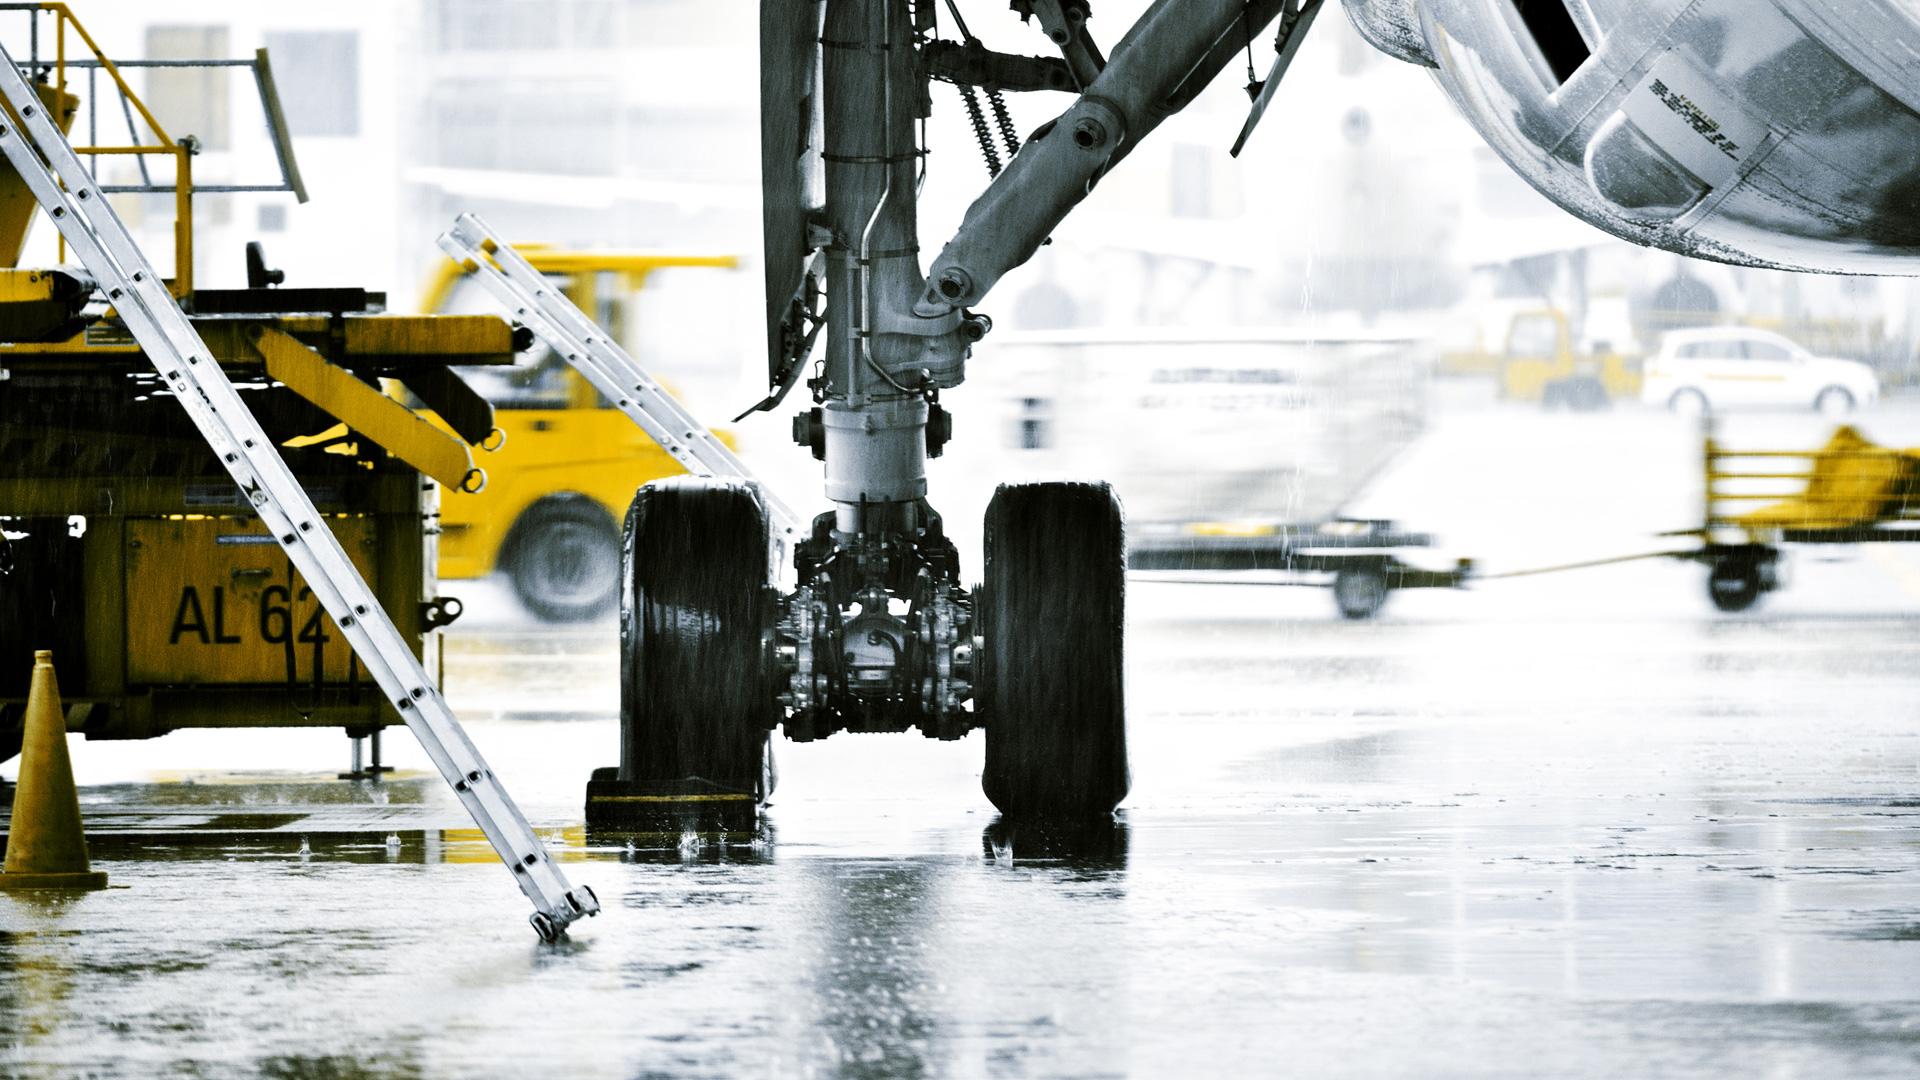 Aircraft actuators